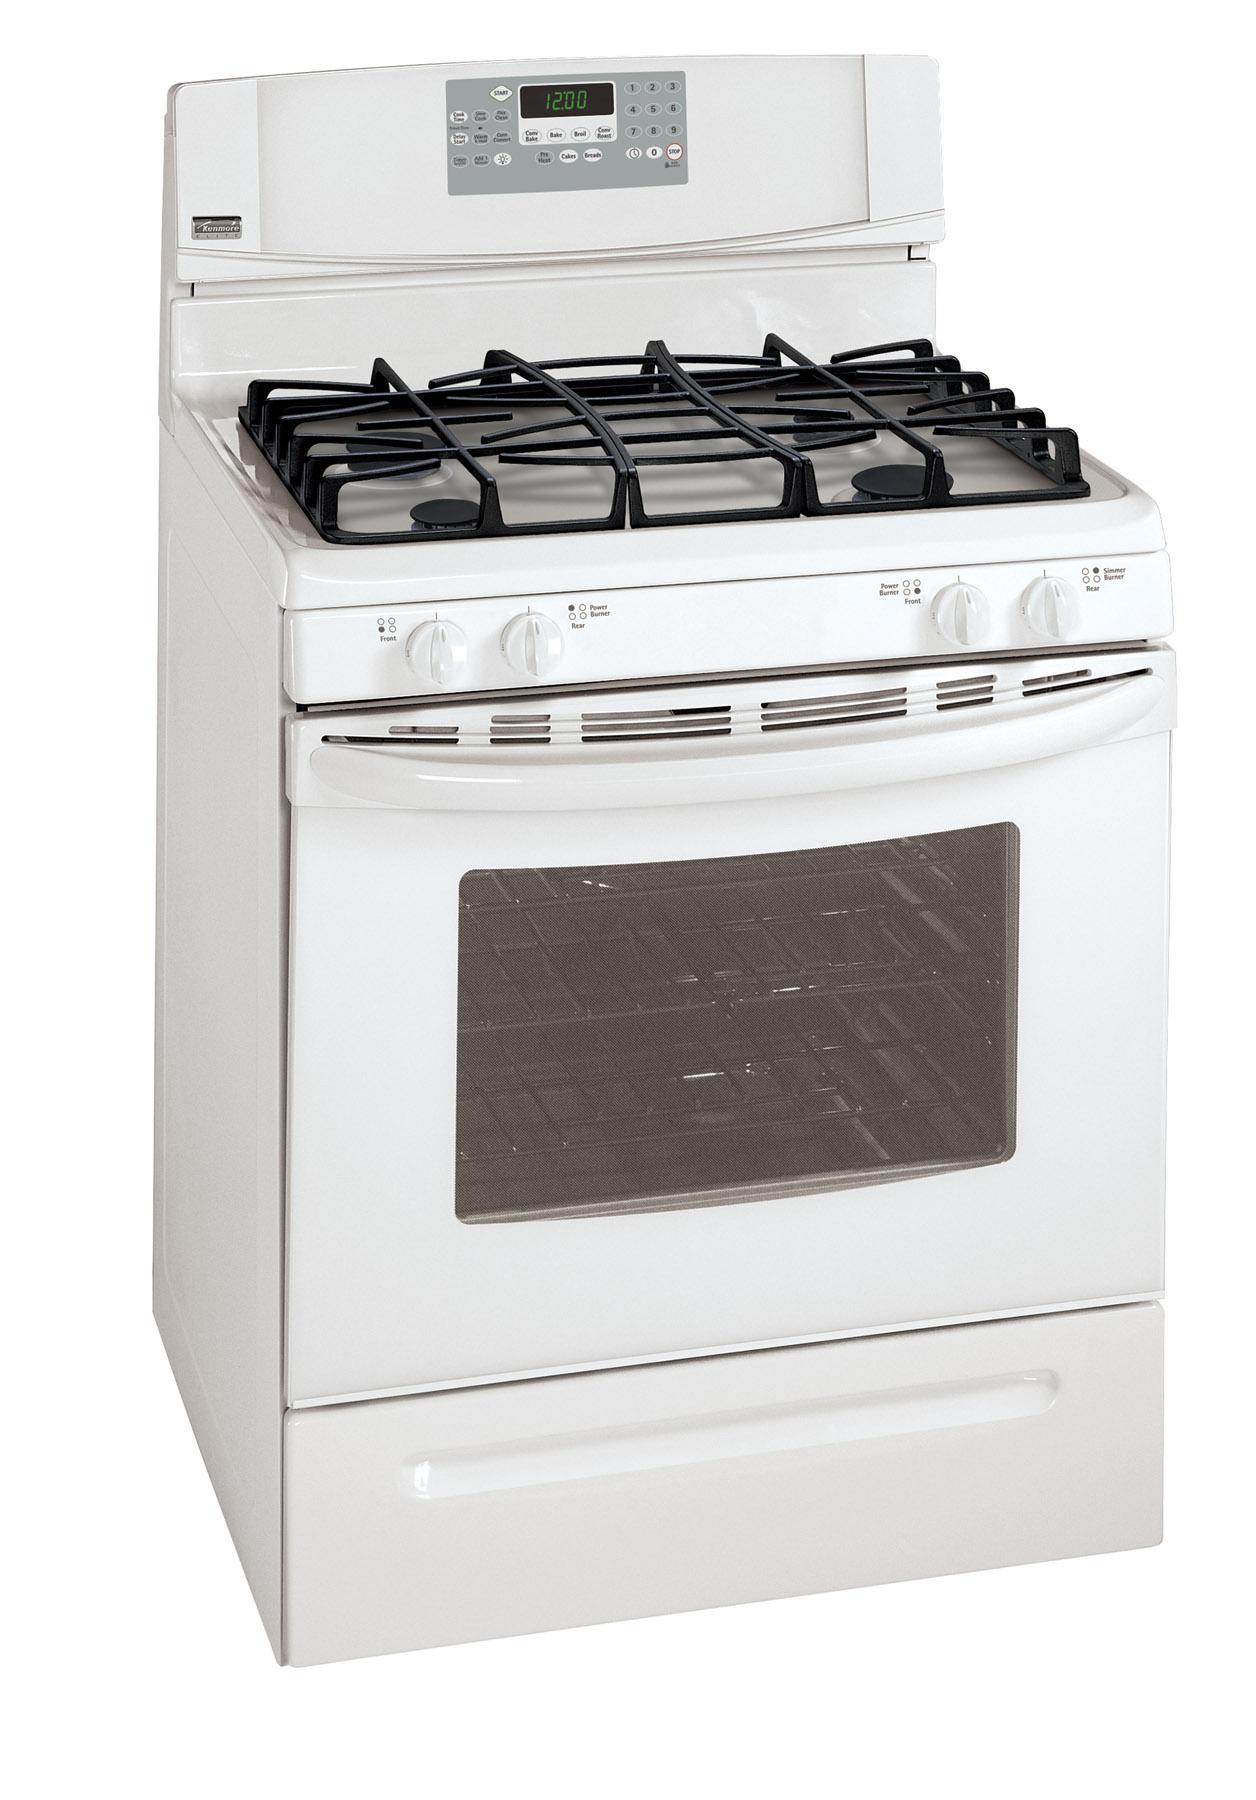 Kenmore Range/Stove/Oven Model 790.79432800 Parts